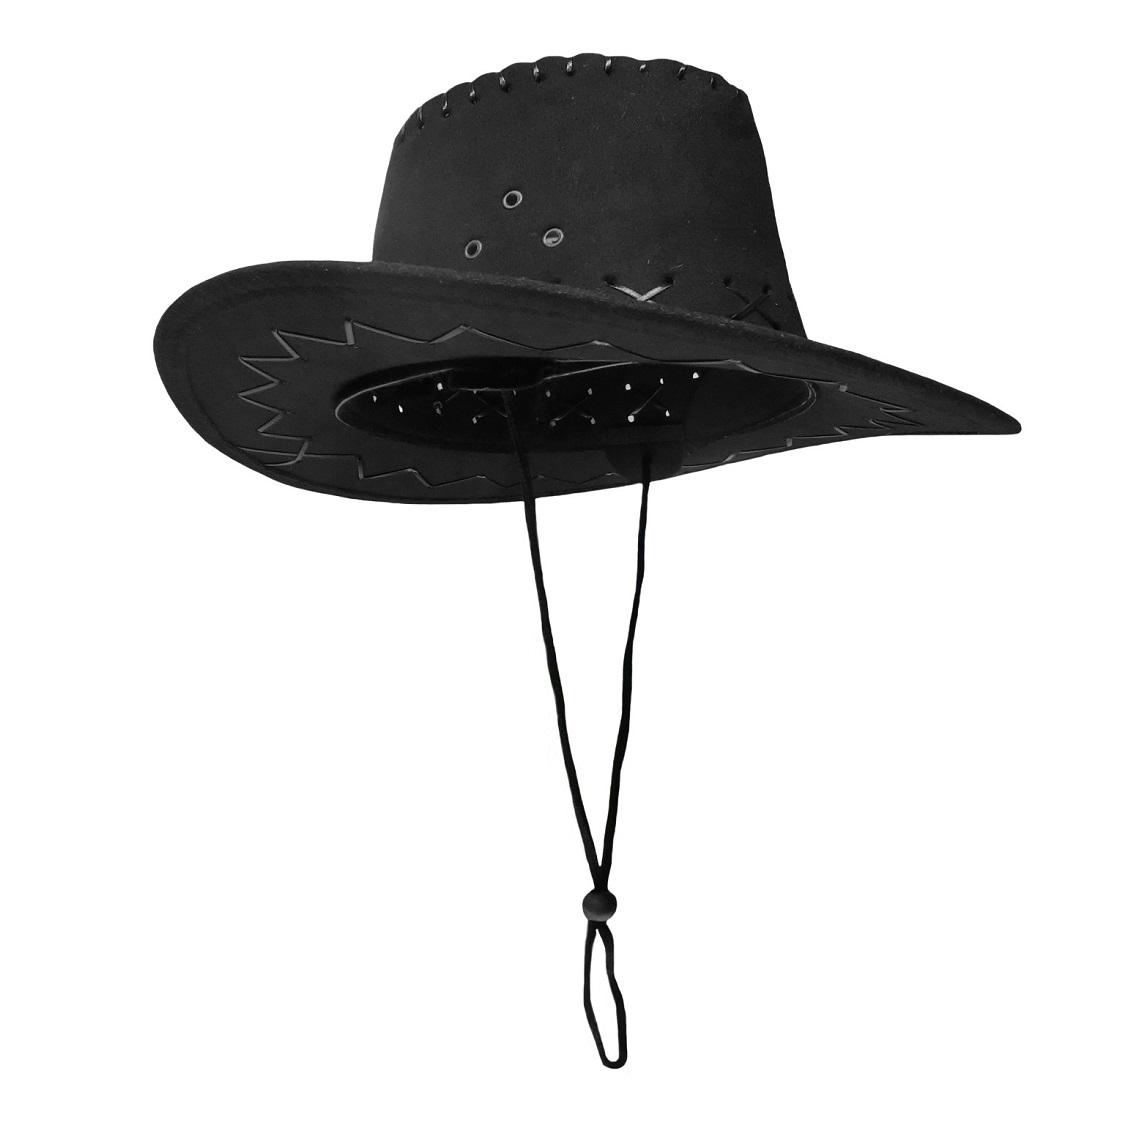 Child Cowboy Cowgirl Faux Suede Hat Western Colors Boys Girls ... 1f696ebc9d8